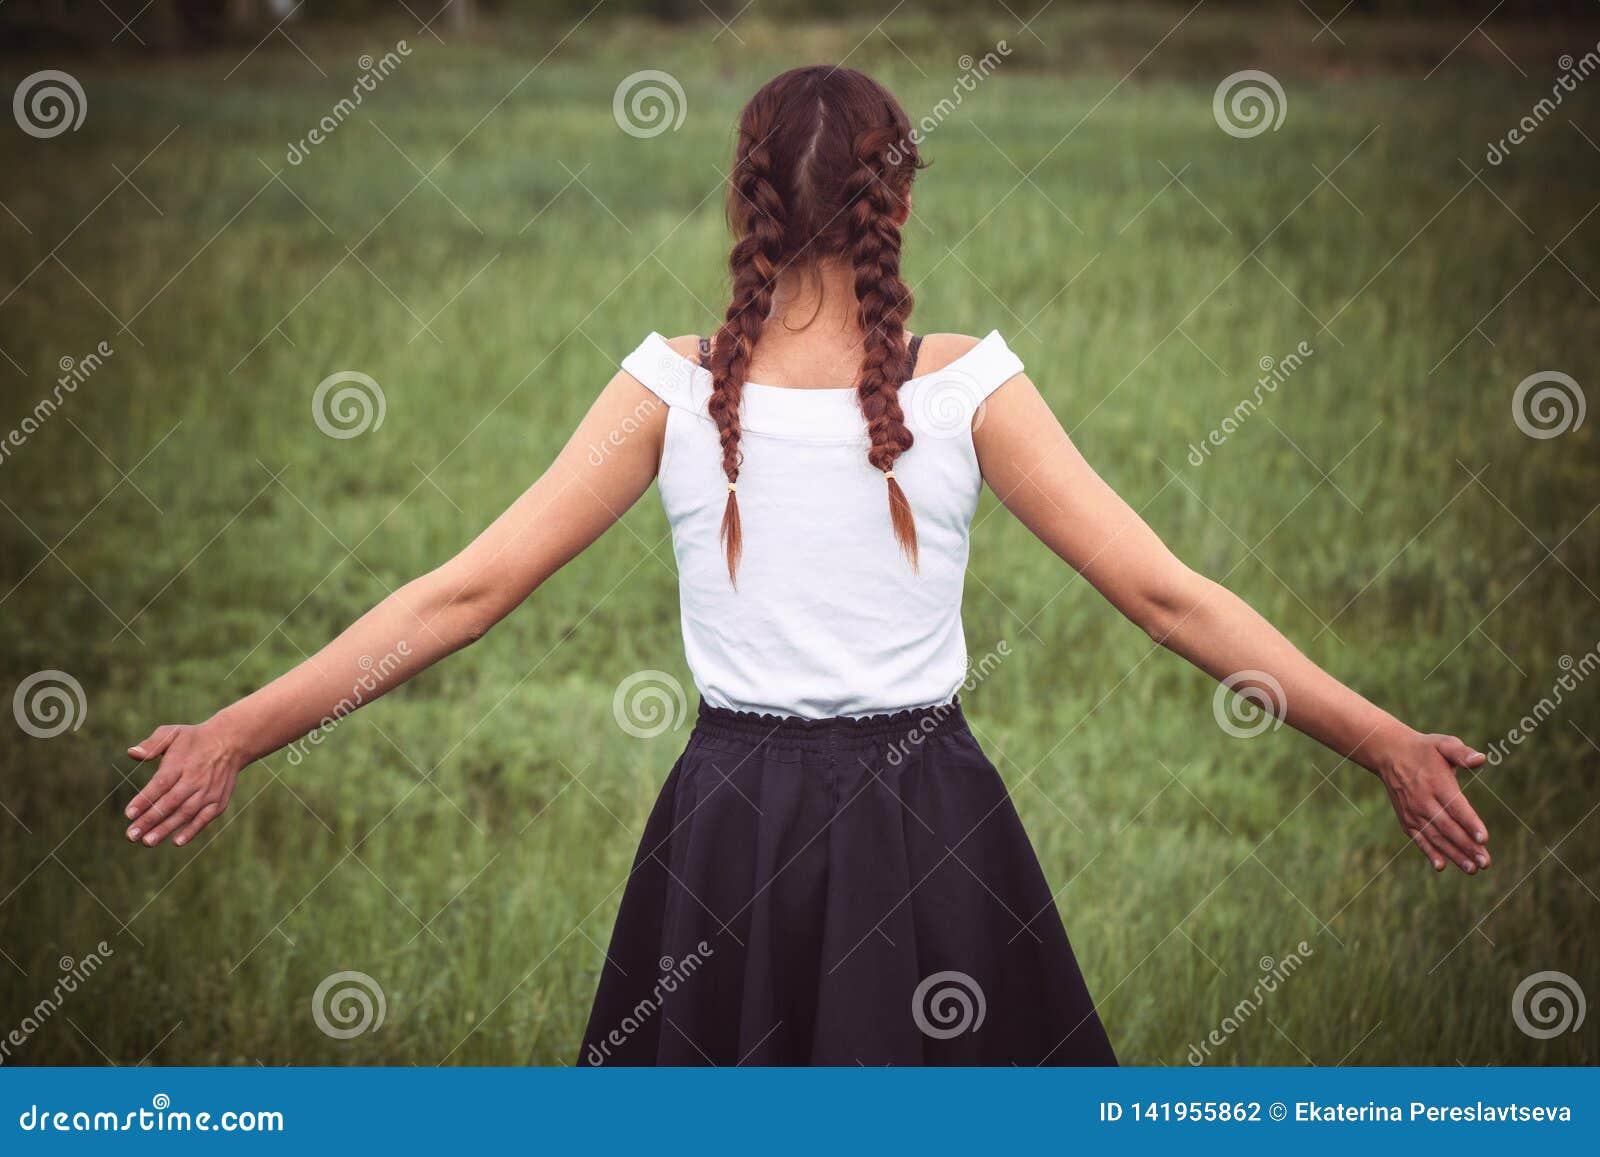 Portrait of enjoying woman raising her hands in the field